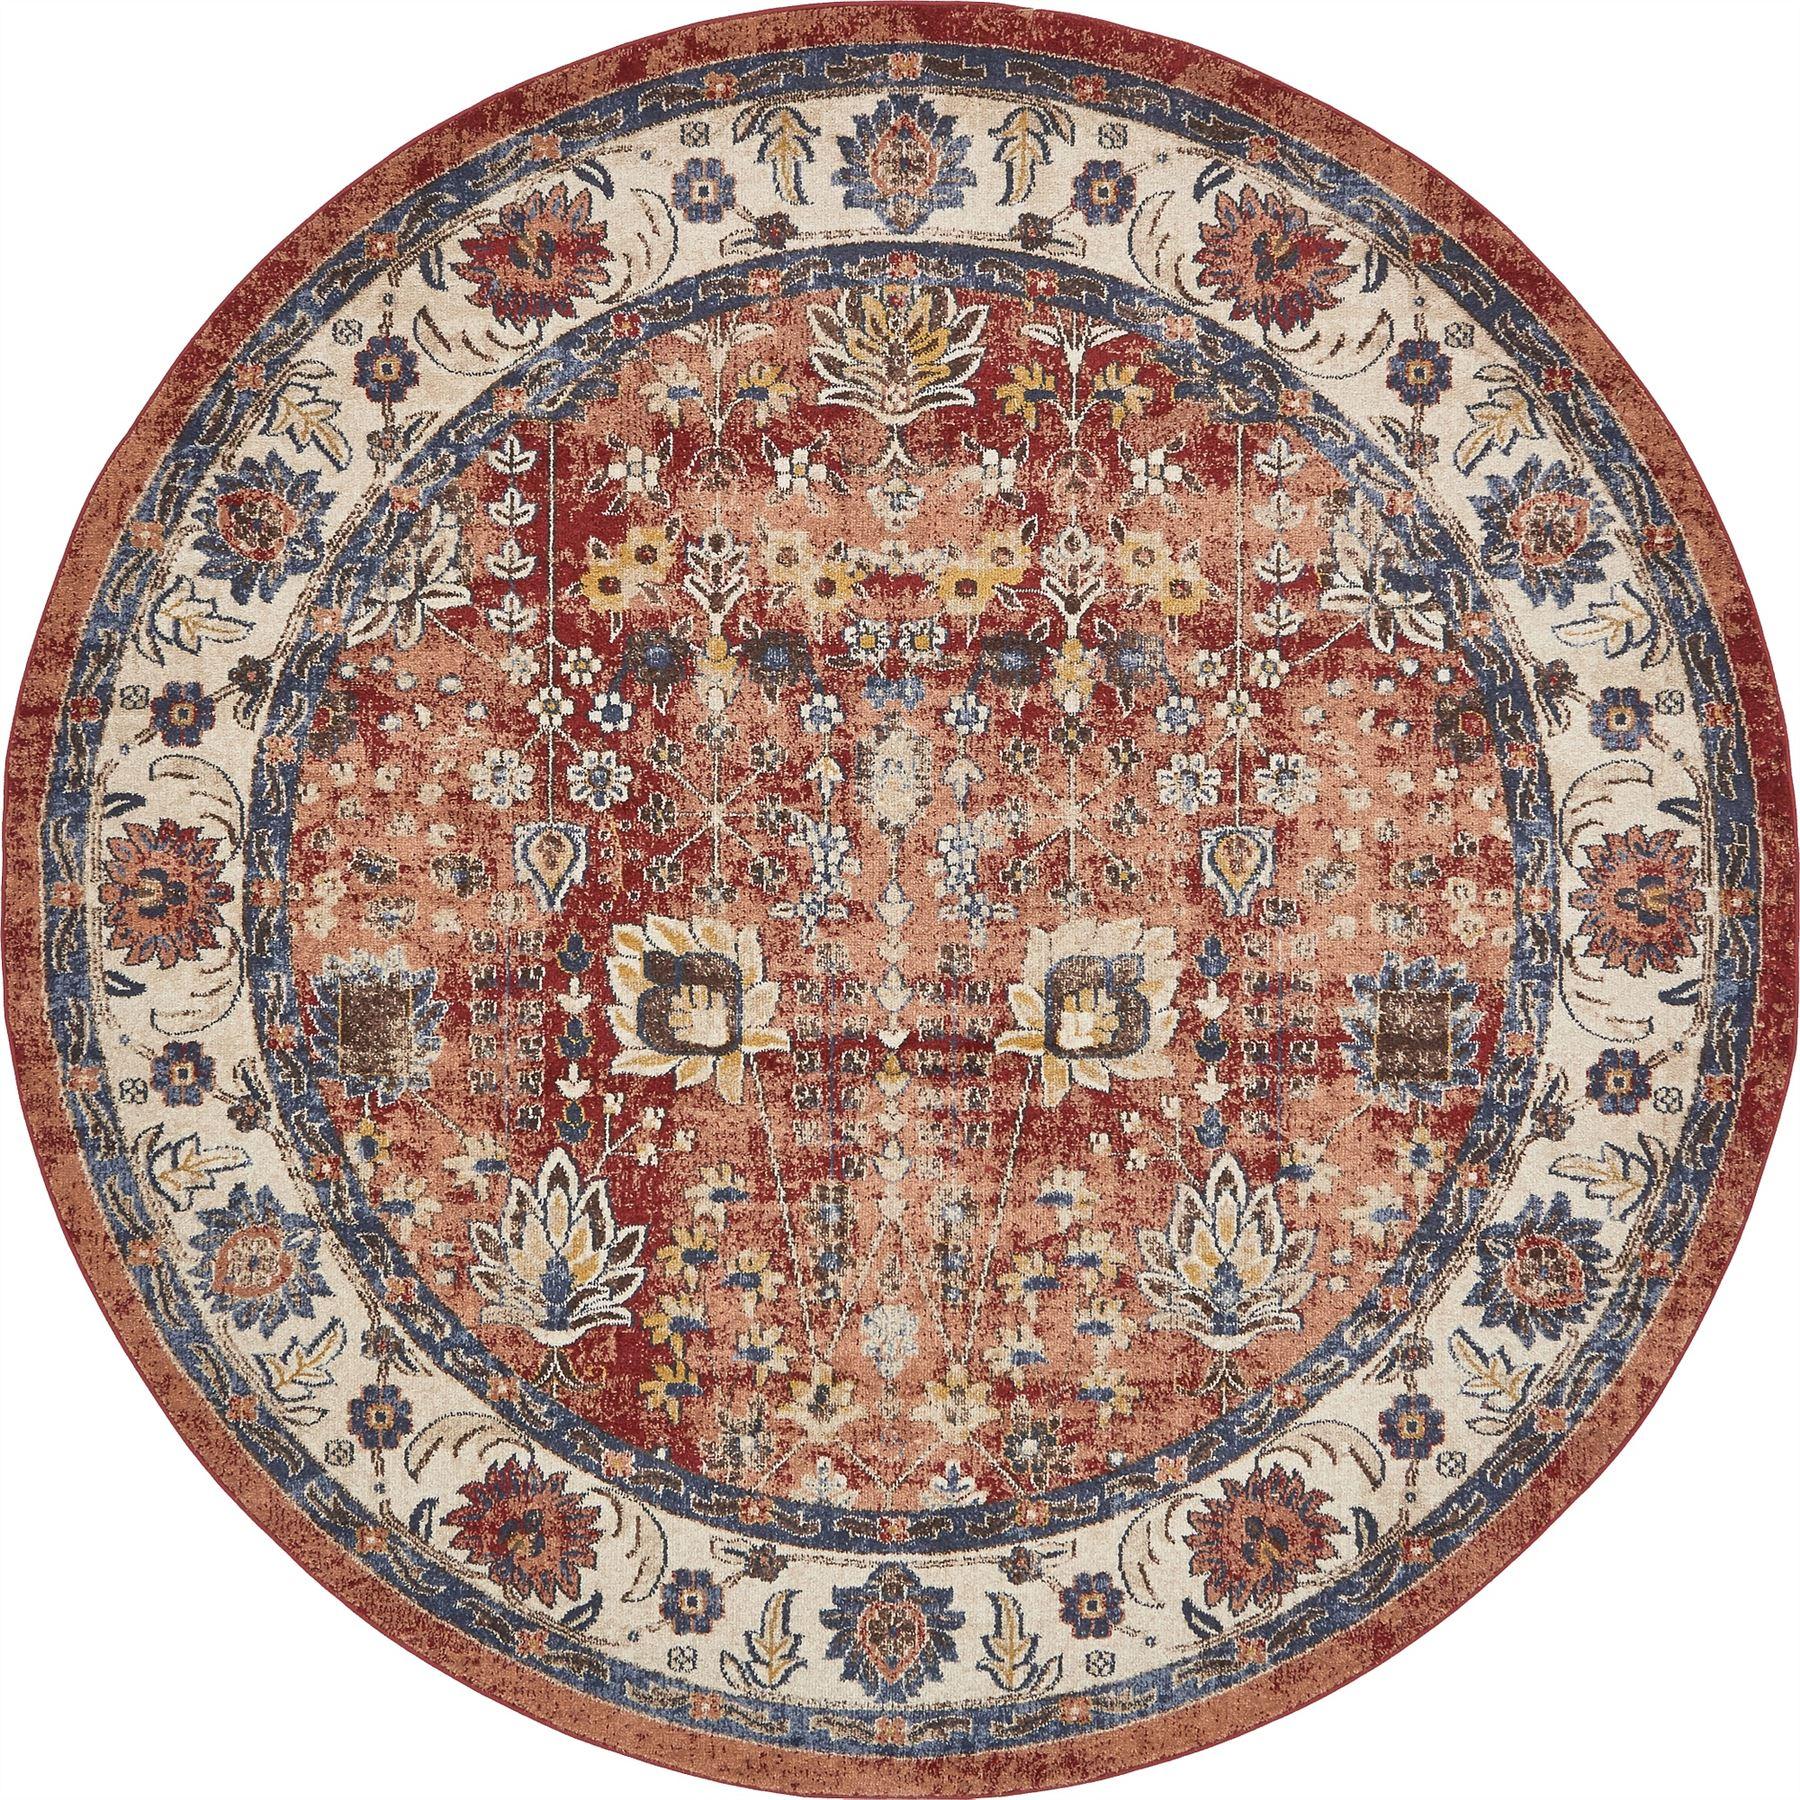 Fringeless Traditional Rug Overdyed Vintage Carpet Floor